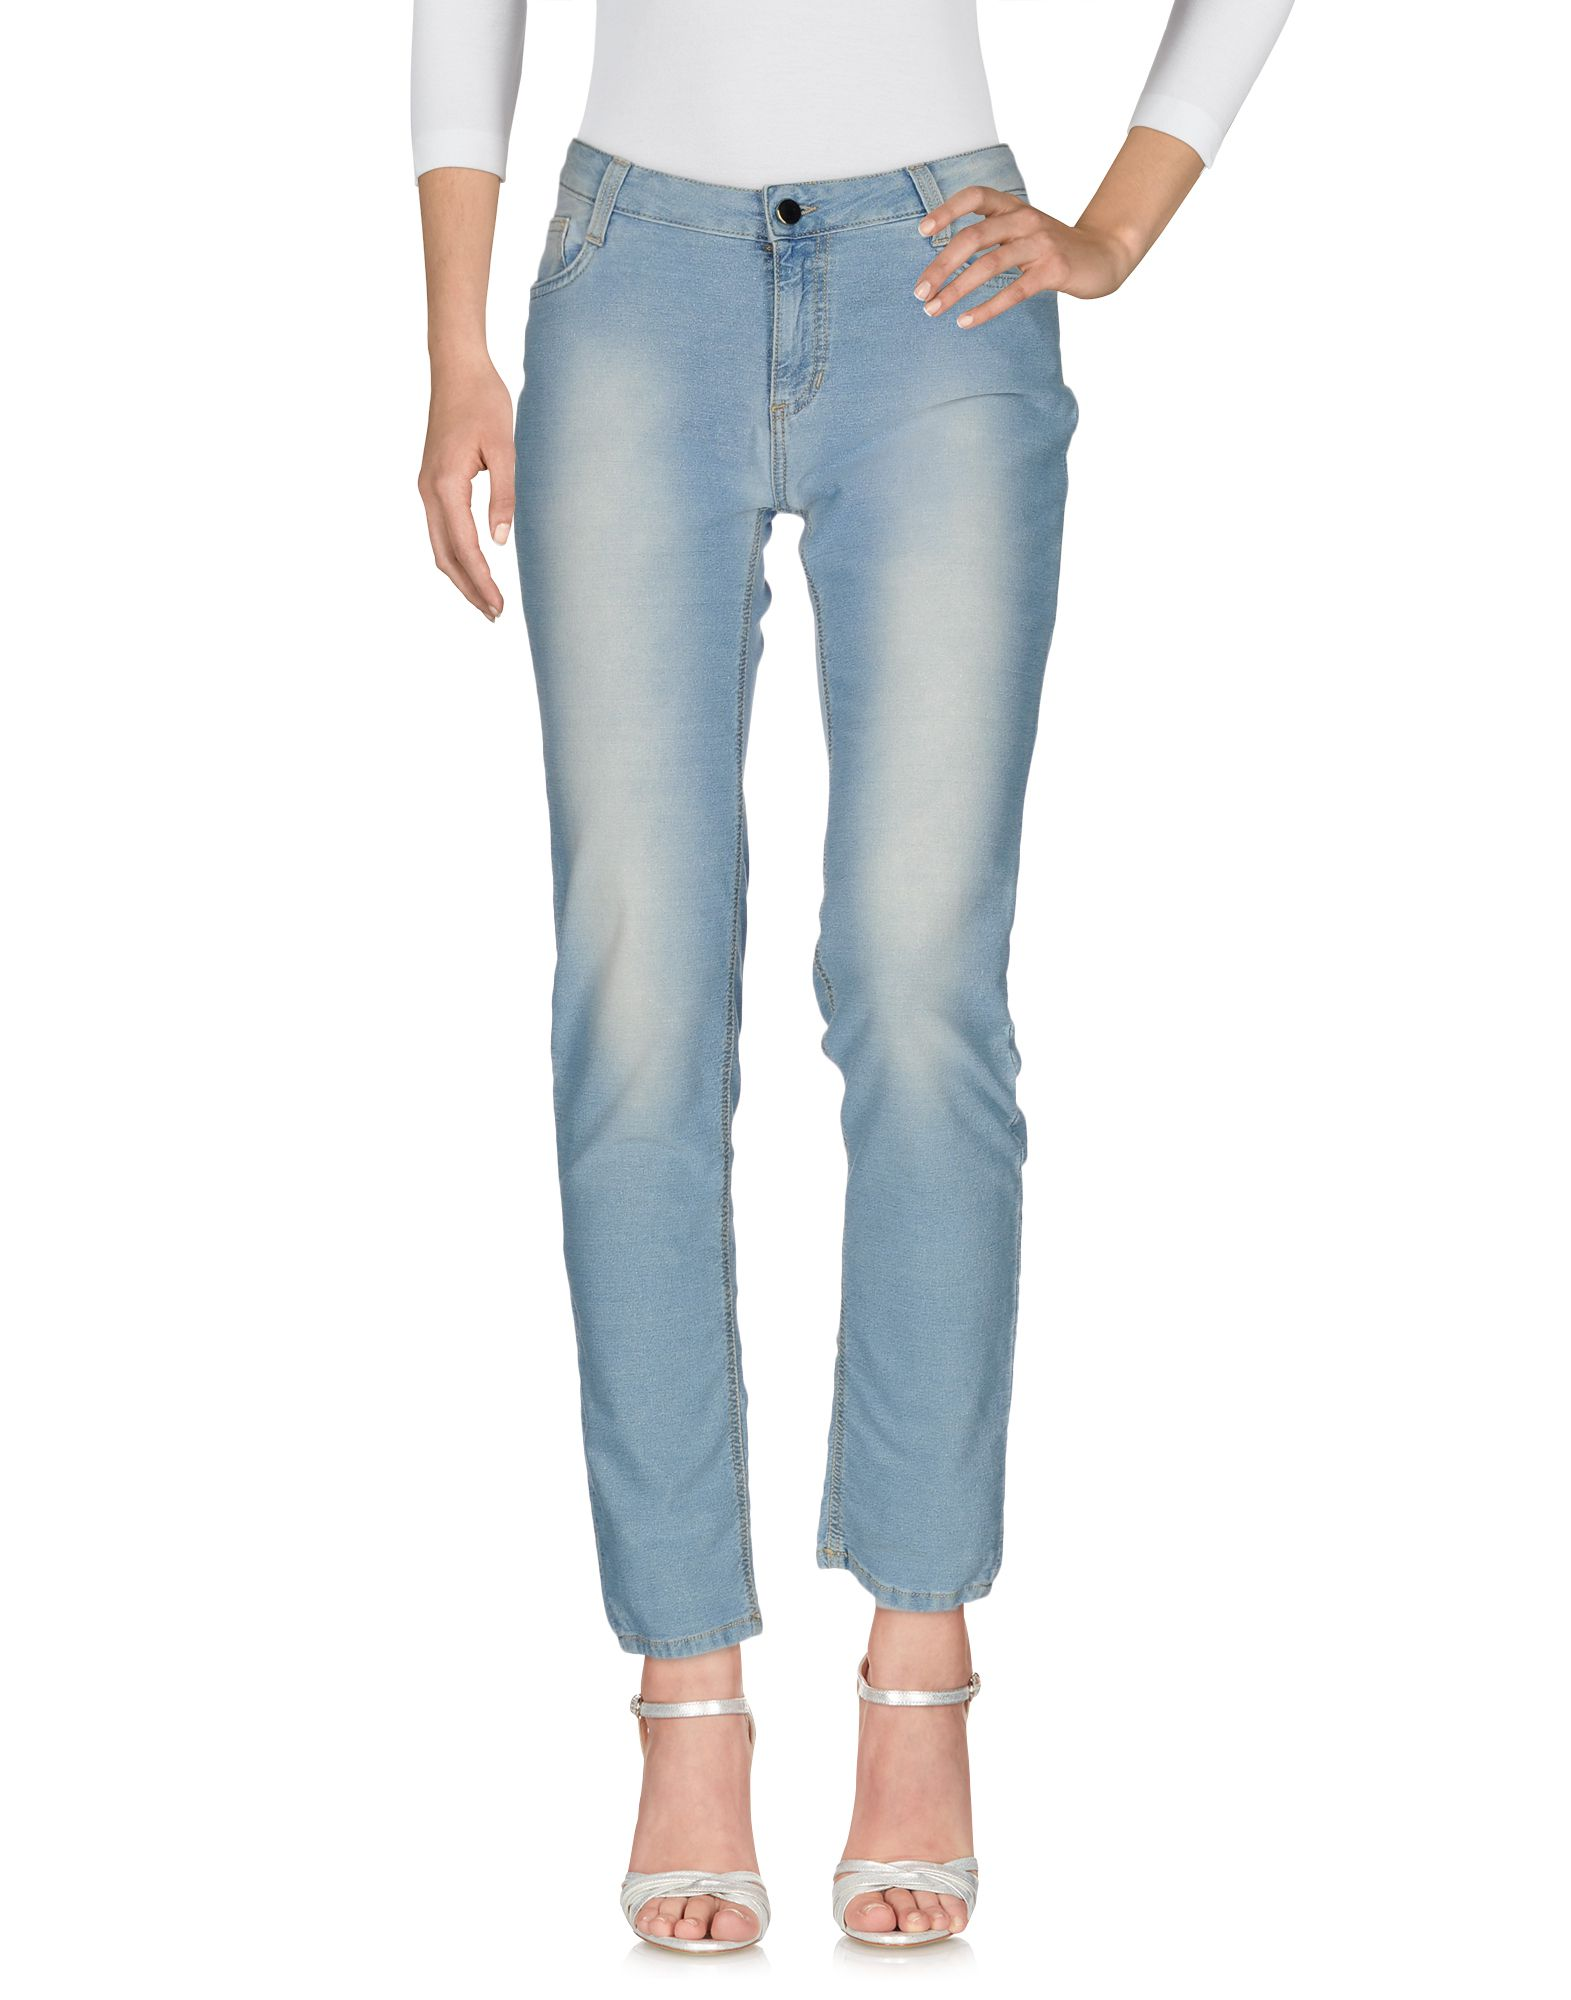 ANNA RACHELE JEANS COLLECTION Damen Jeanshose Farbe Blau Größe 5